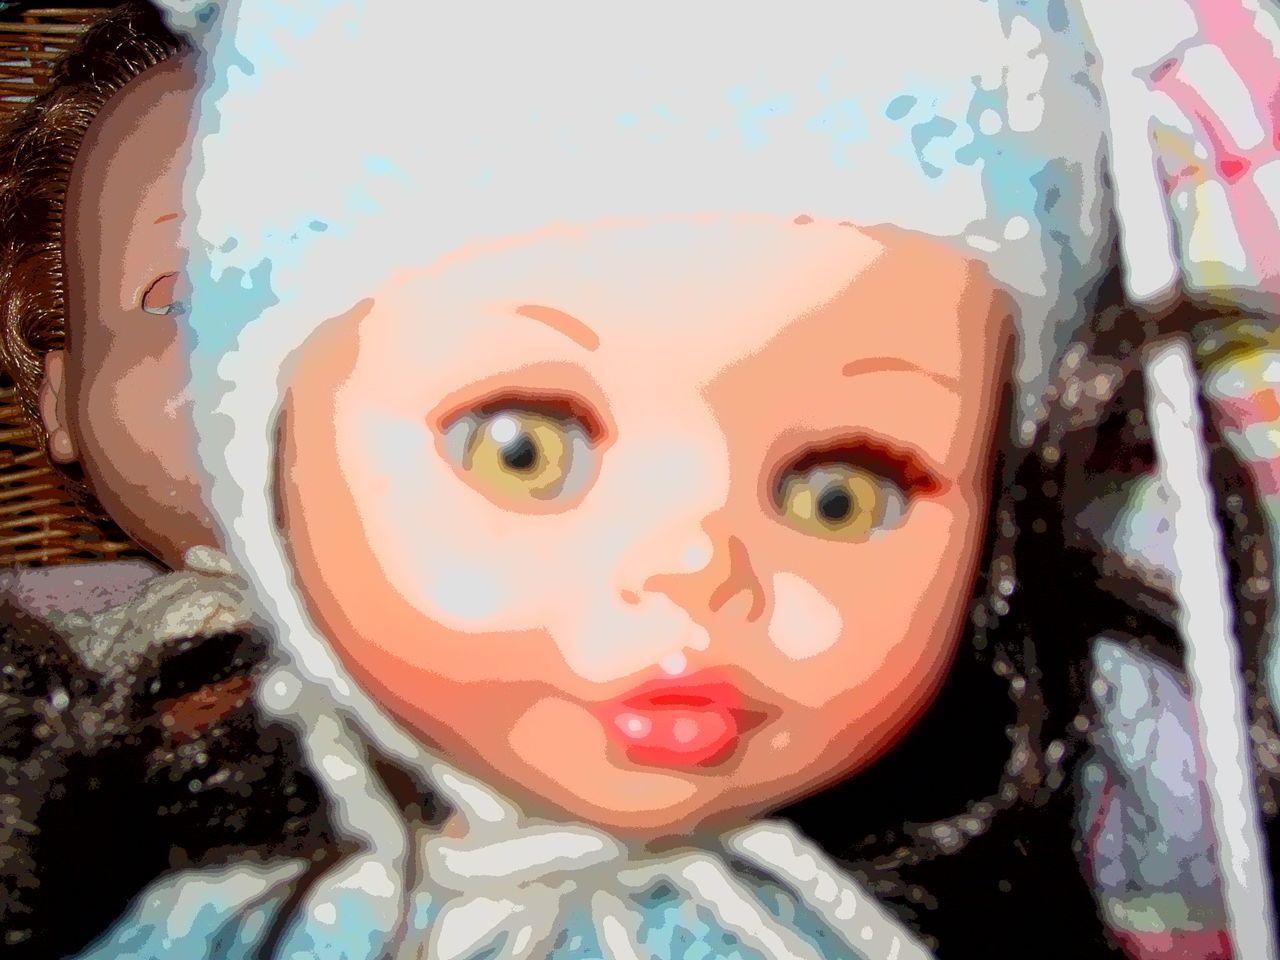 Catrien the doll